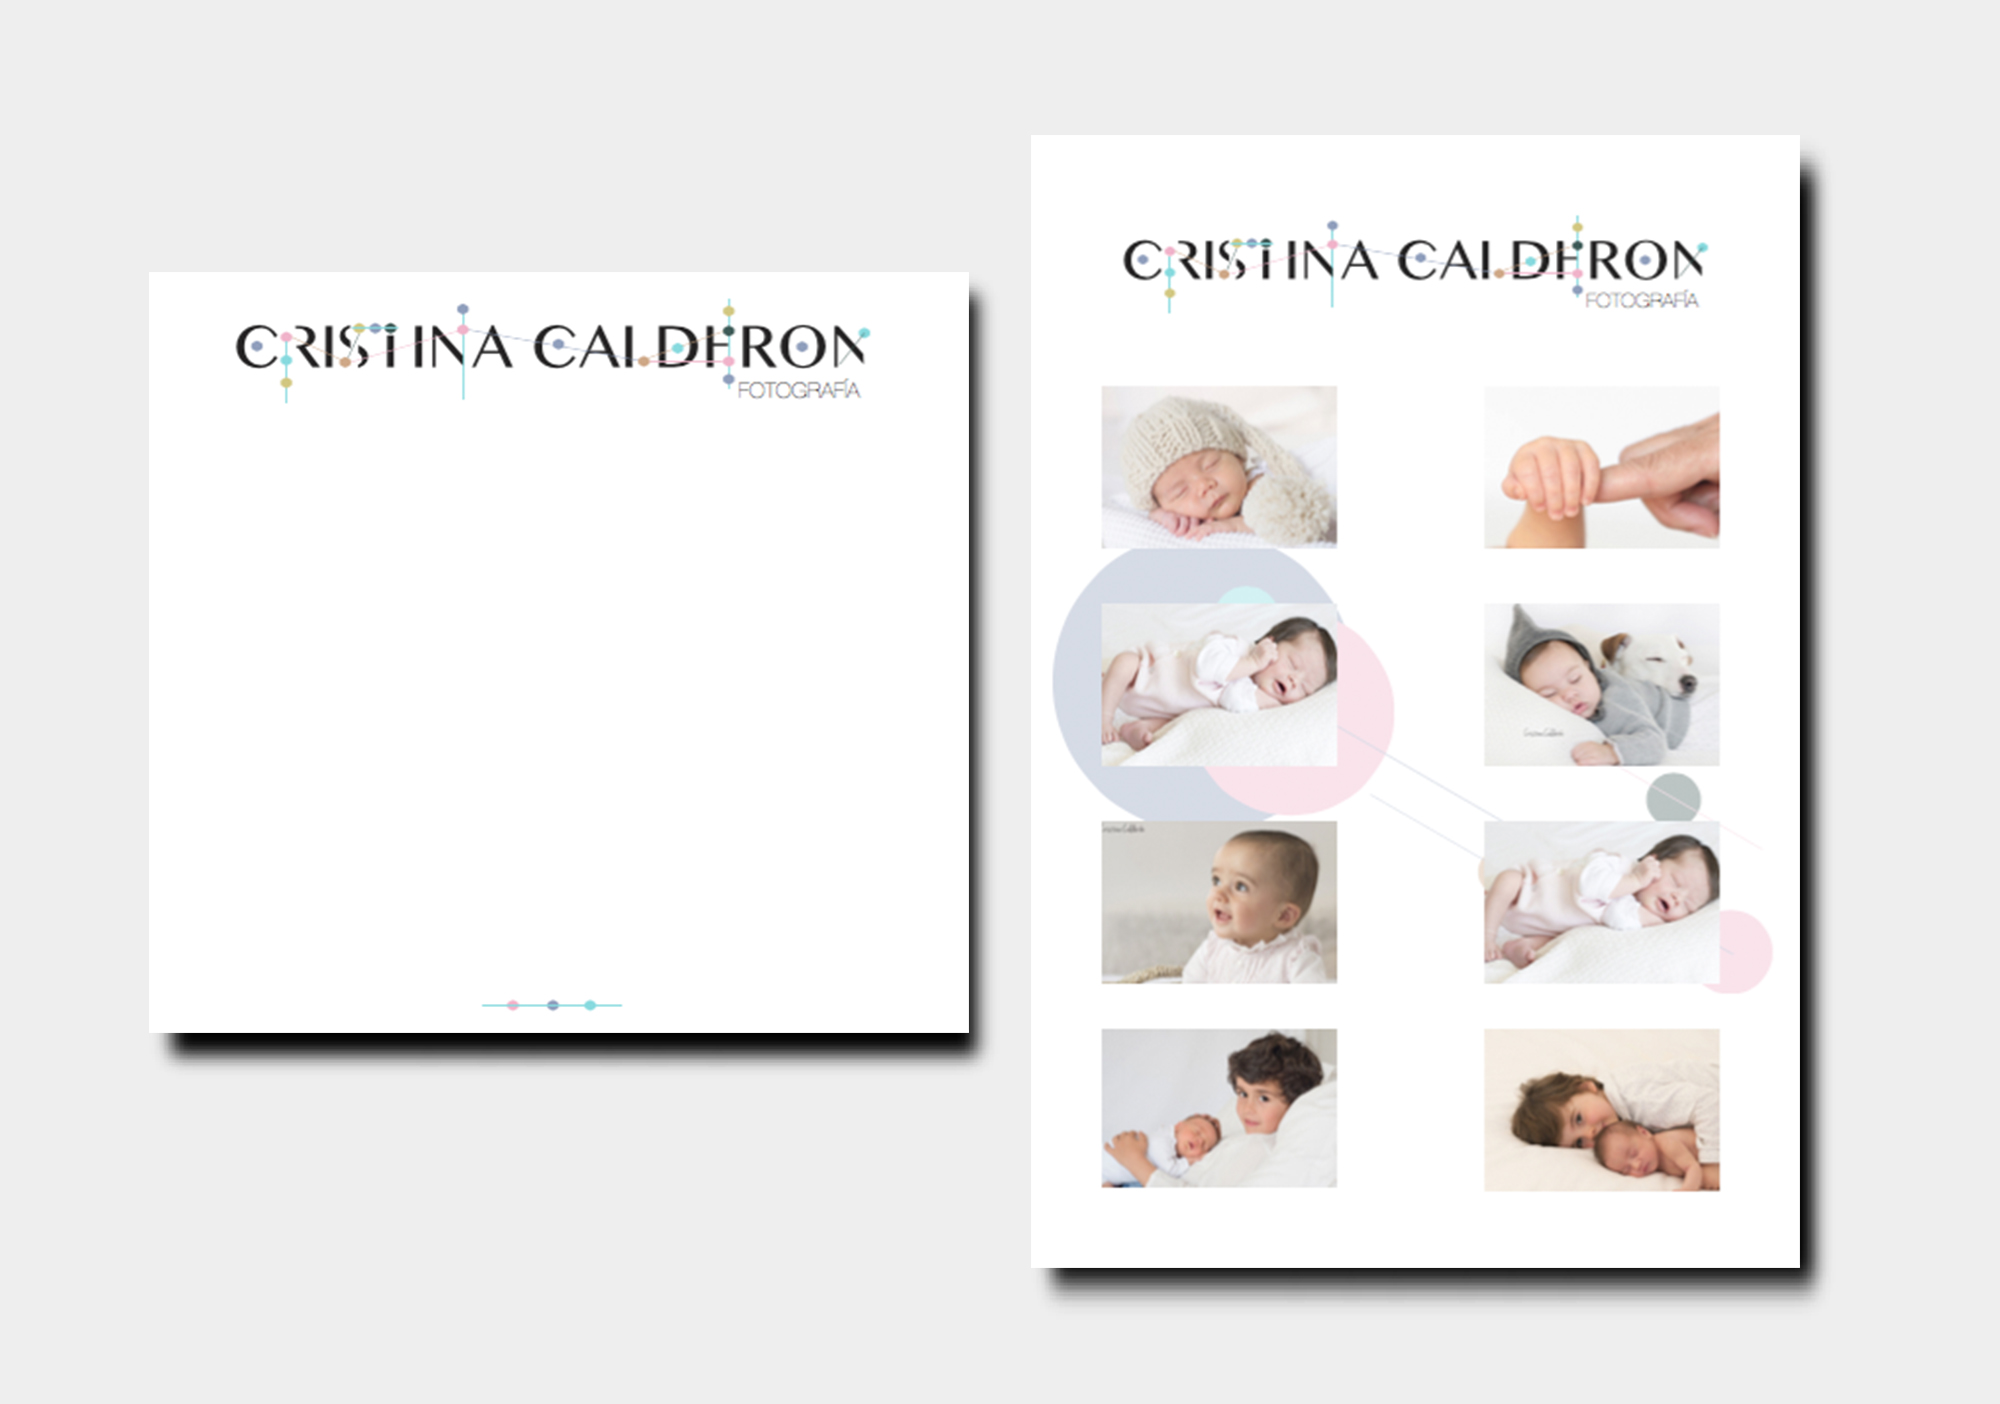 CRISTINA CALDERON.jpg